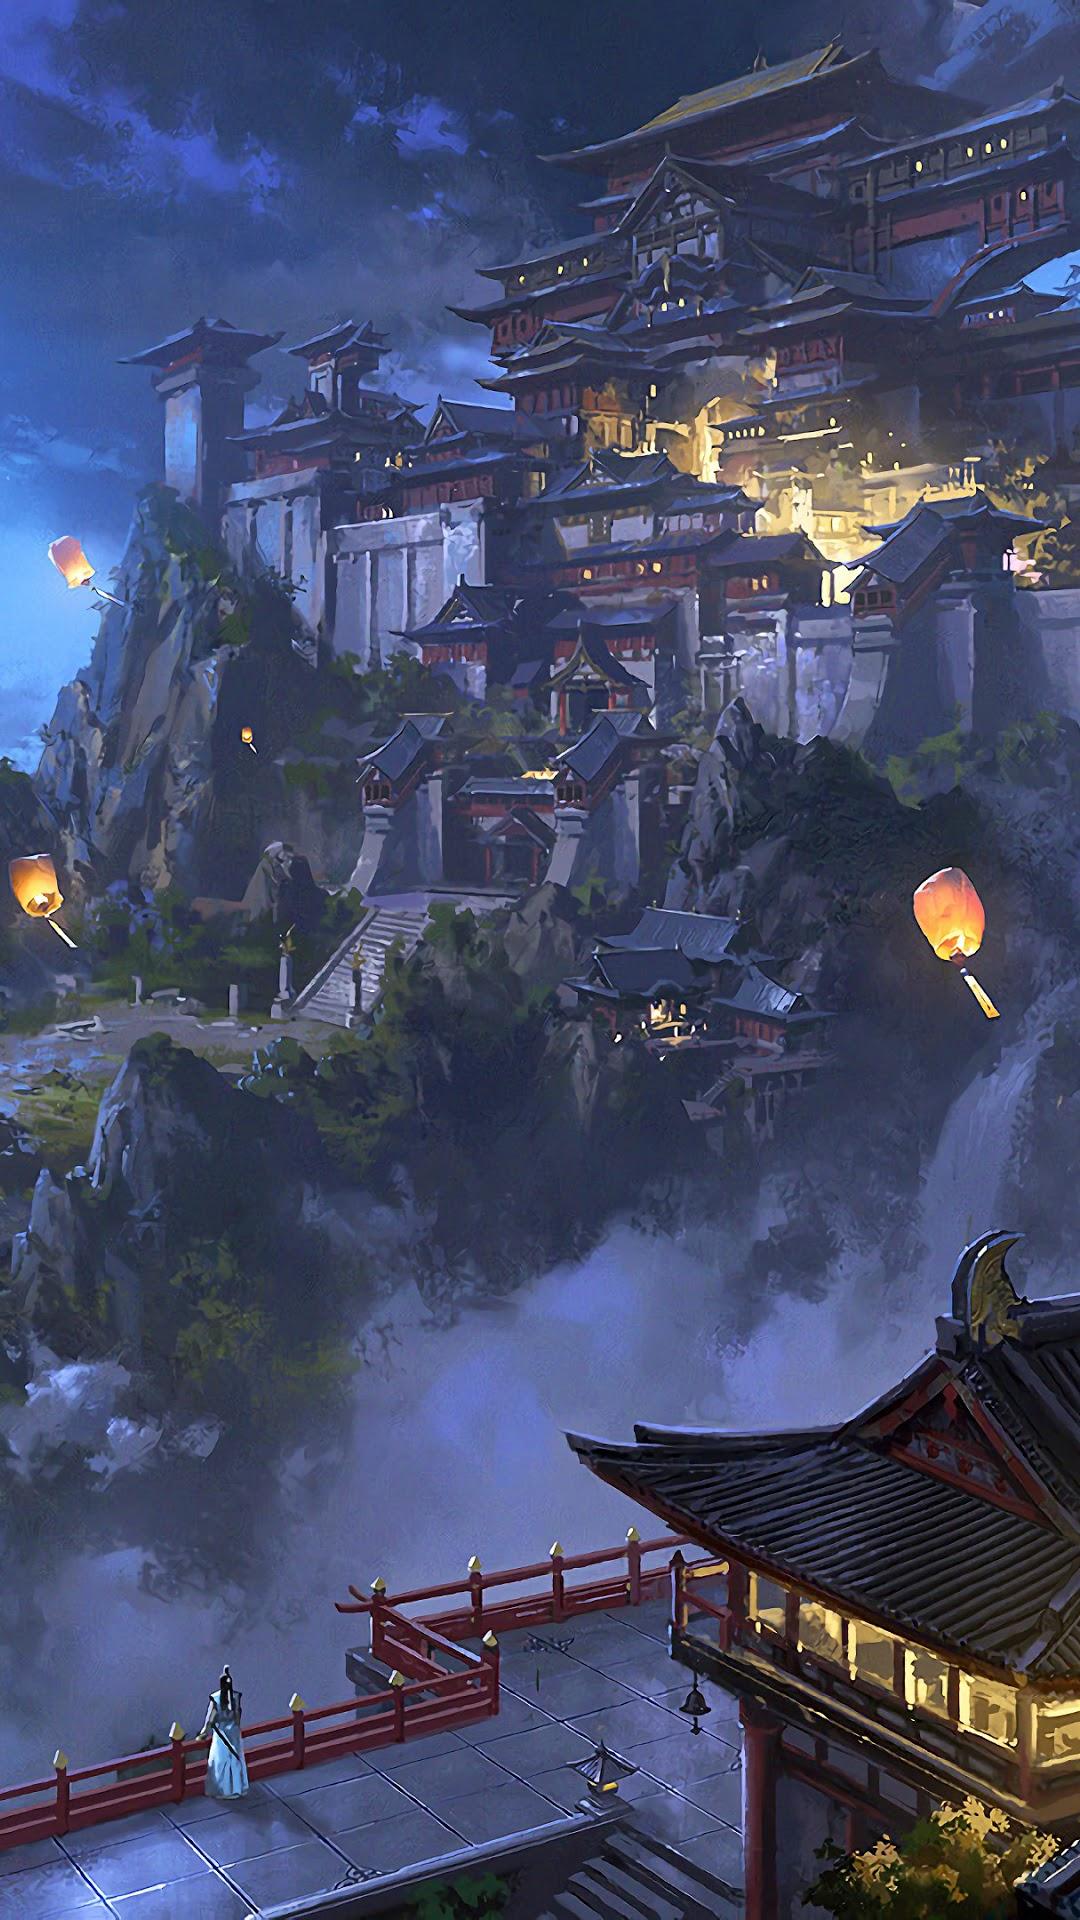 Anime Sky Lantern Mountain Japanese Castle Night Iphone 11 Wallpaper 4k Japan 1080x1920 Wallpaper Teahub Io